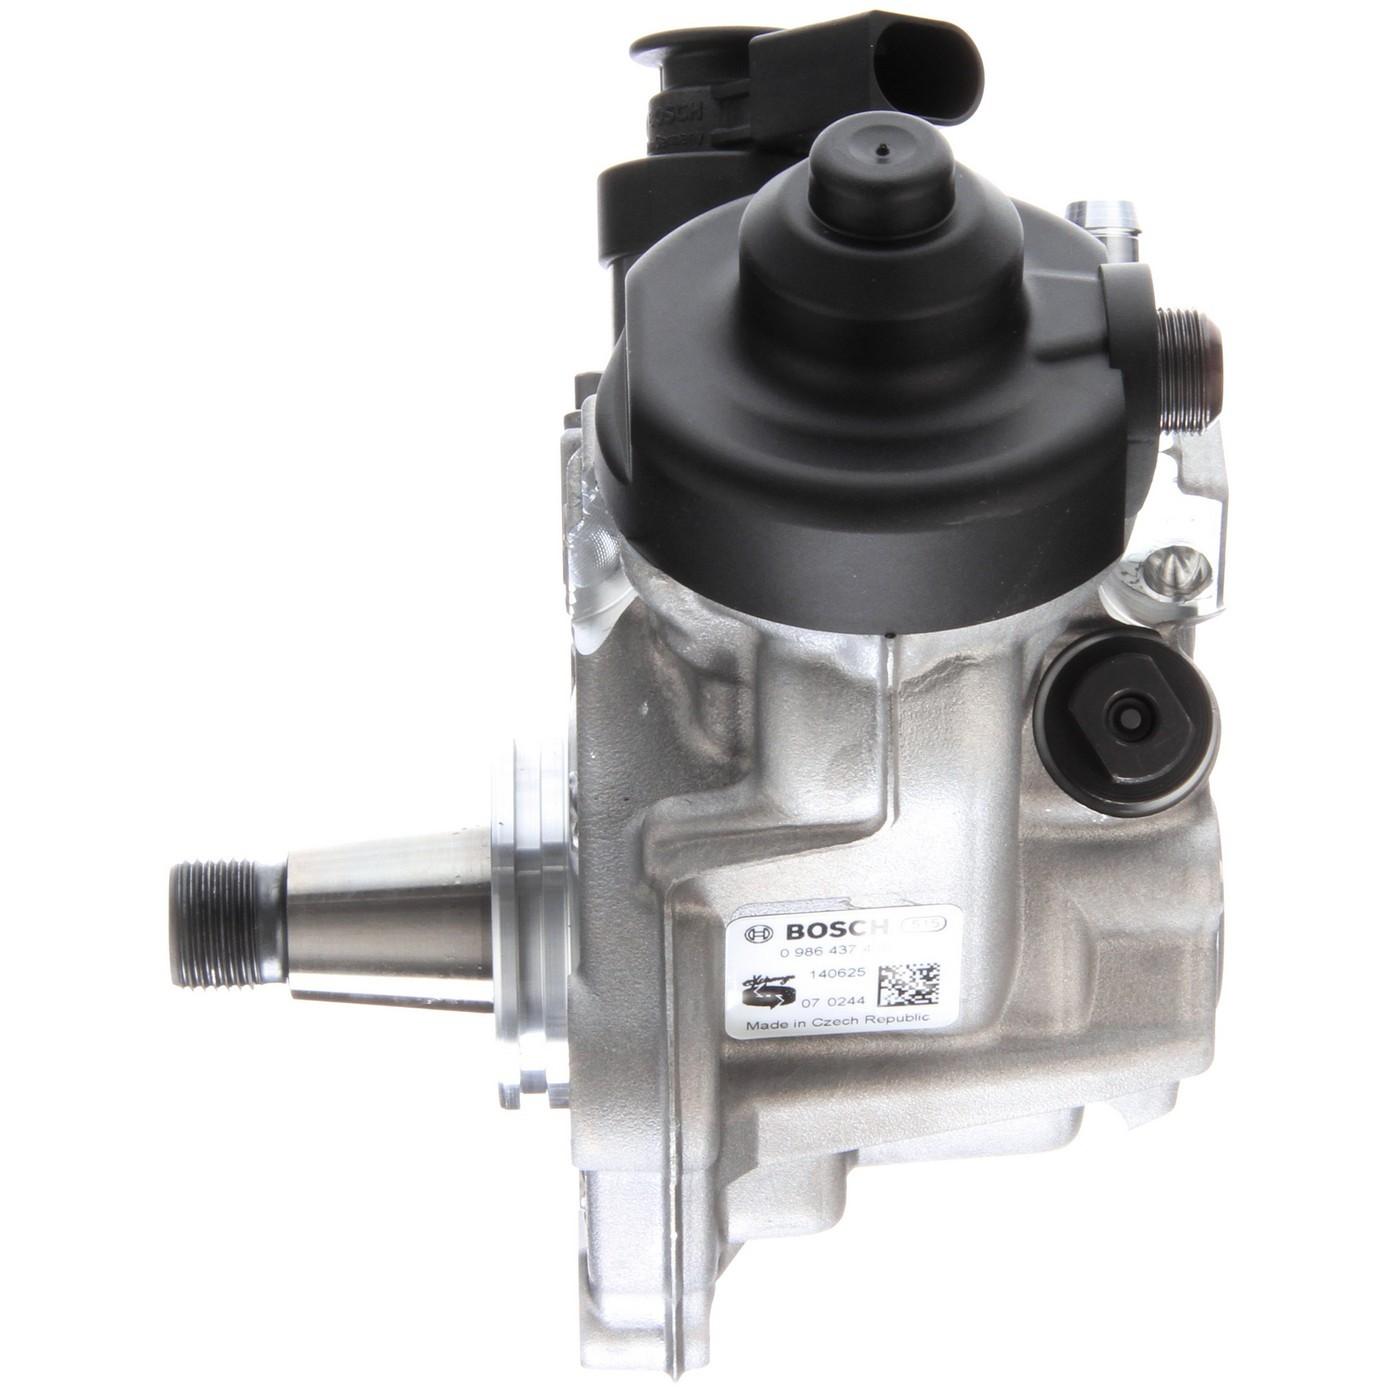 Remanufactured High Pressure Pumps Bosch Auto Parts Fuel Pump